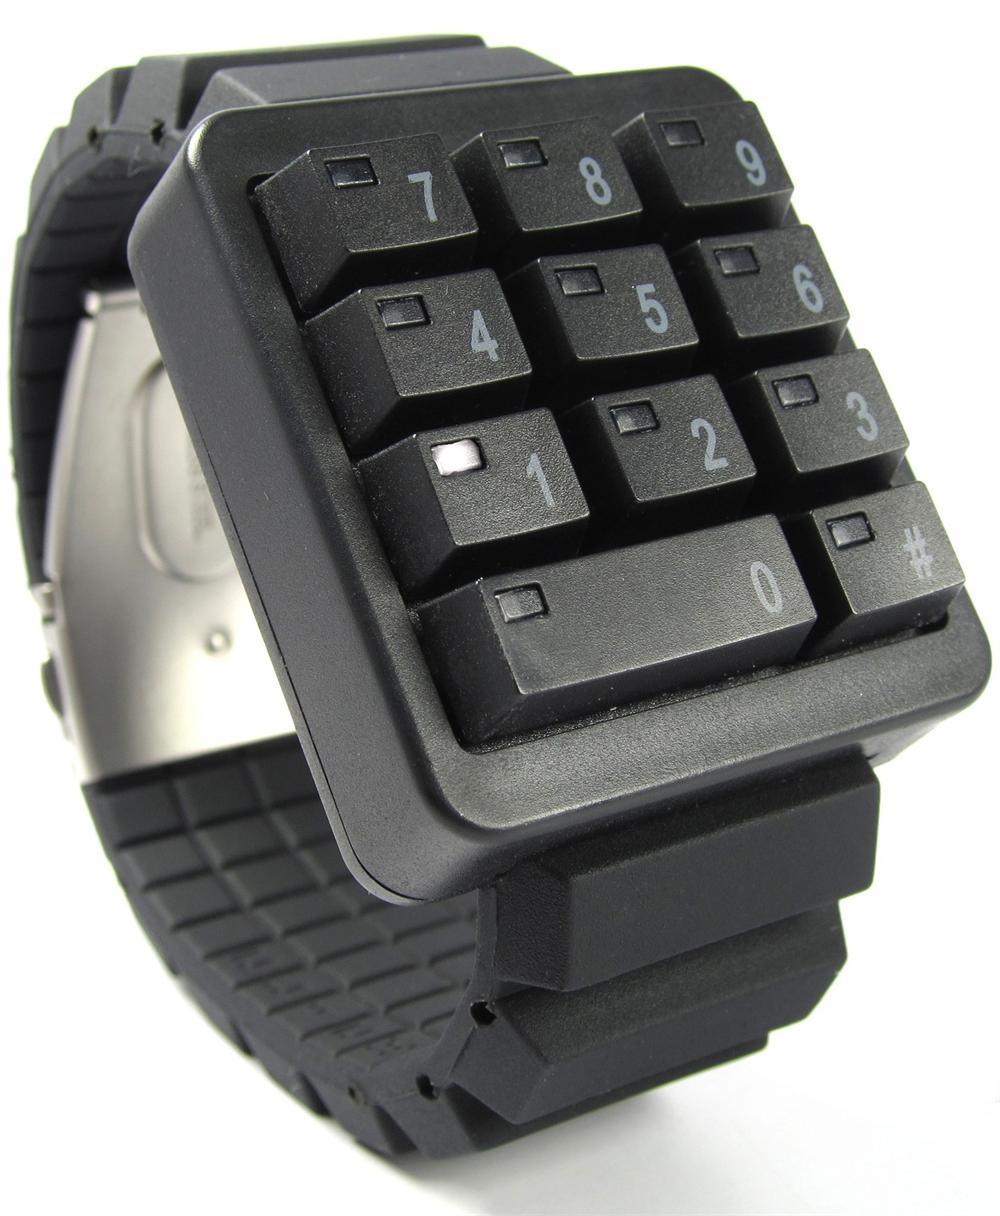 Click Black Keypad Hidden Time Watch Geekextreme